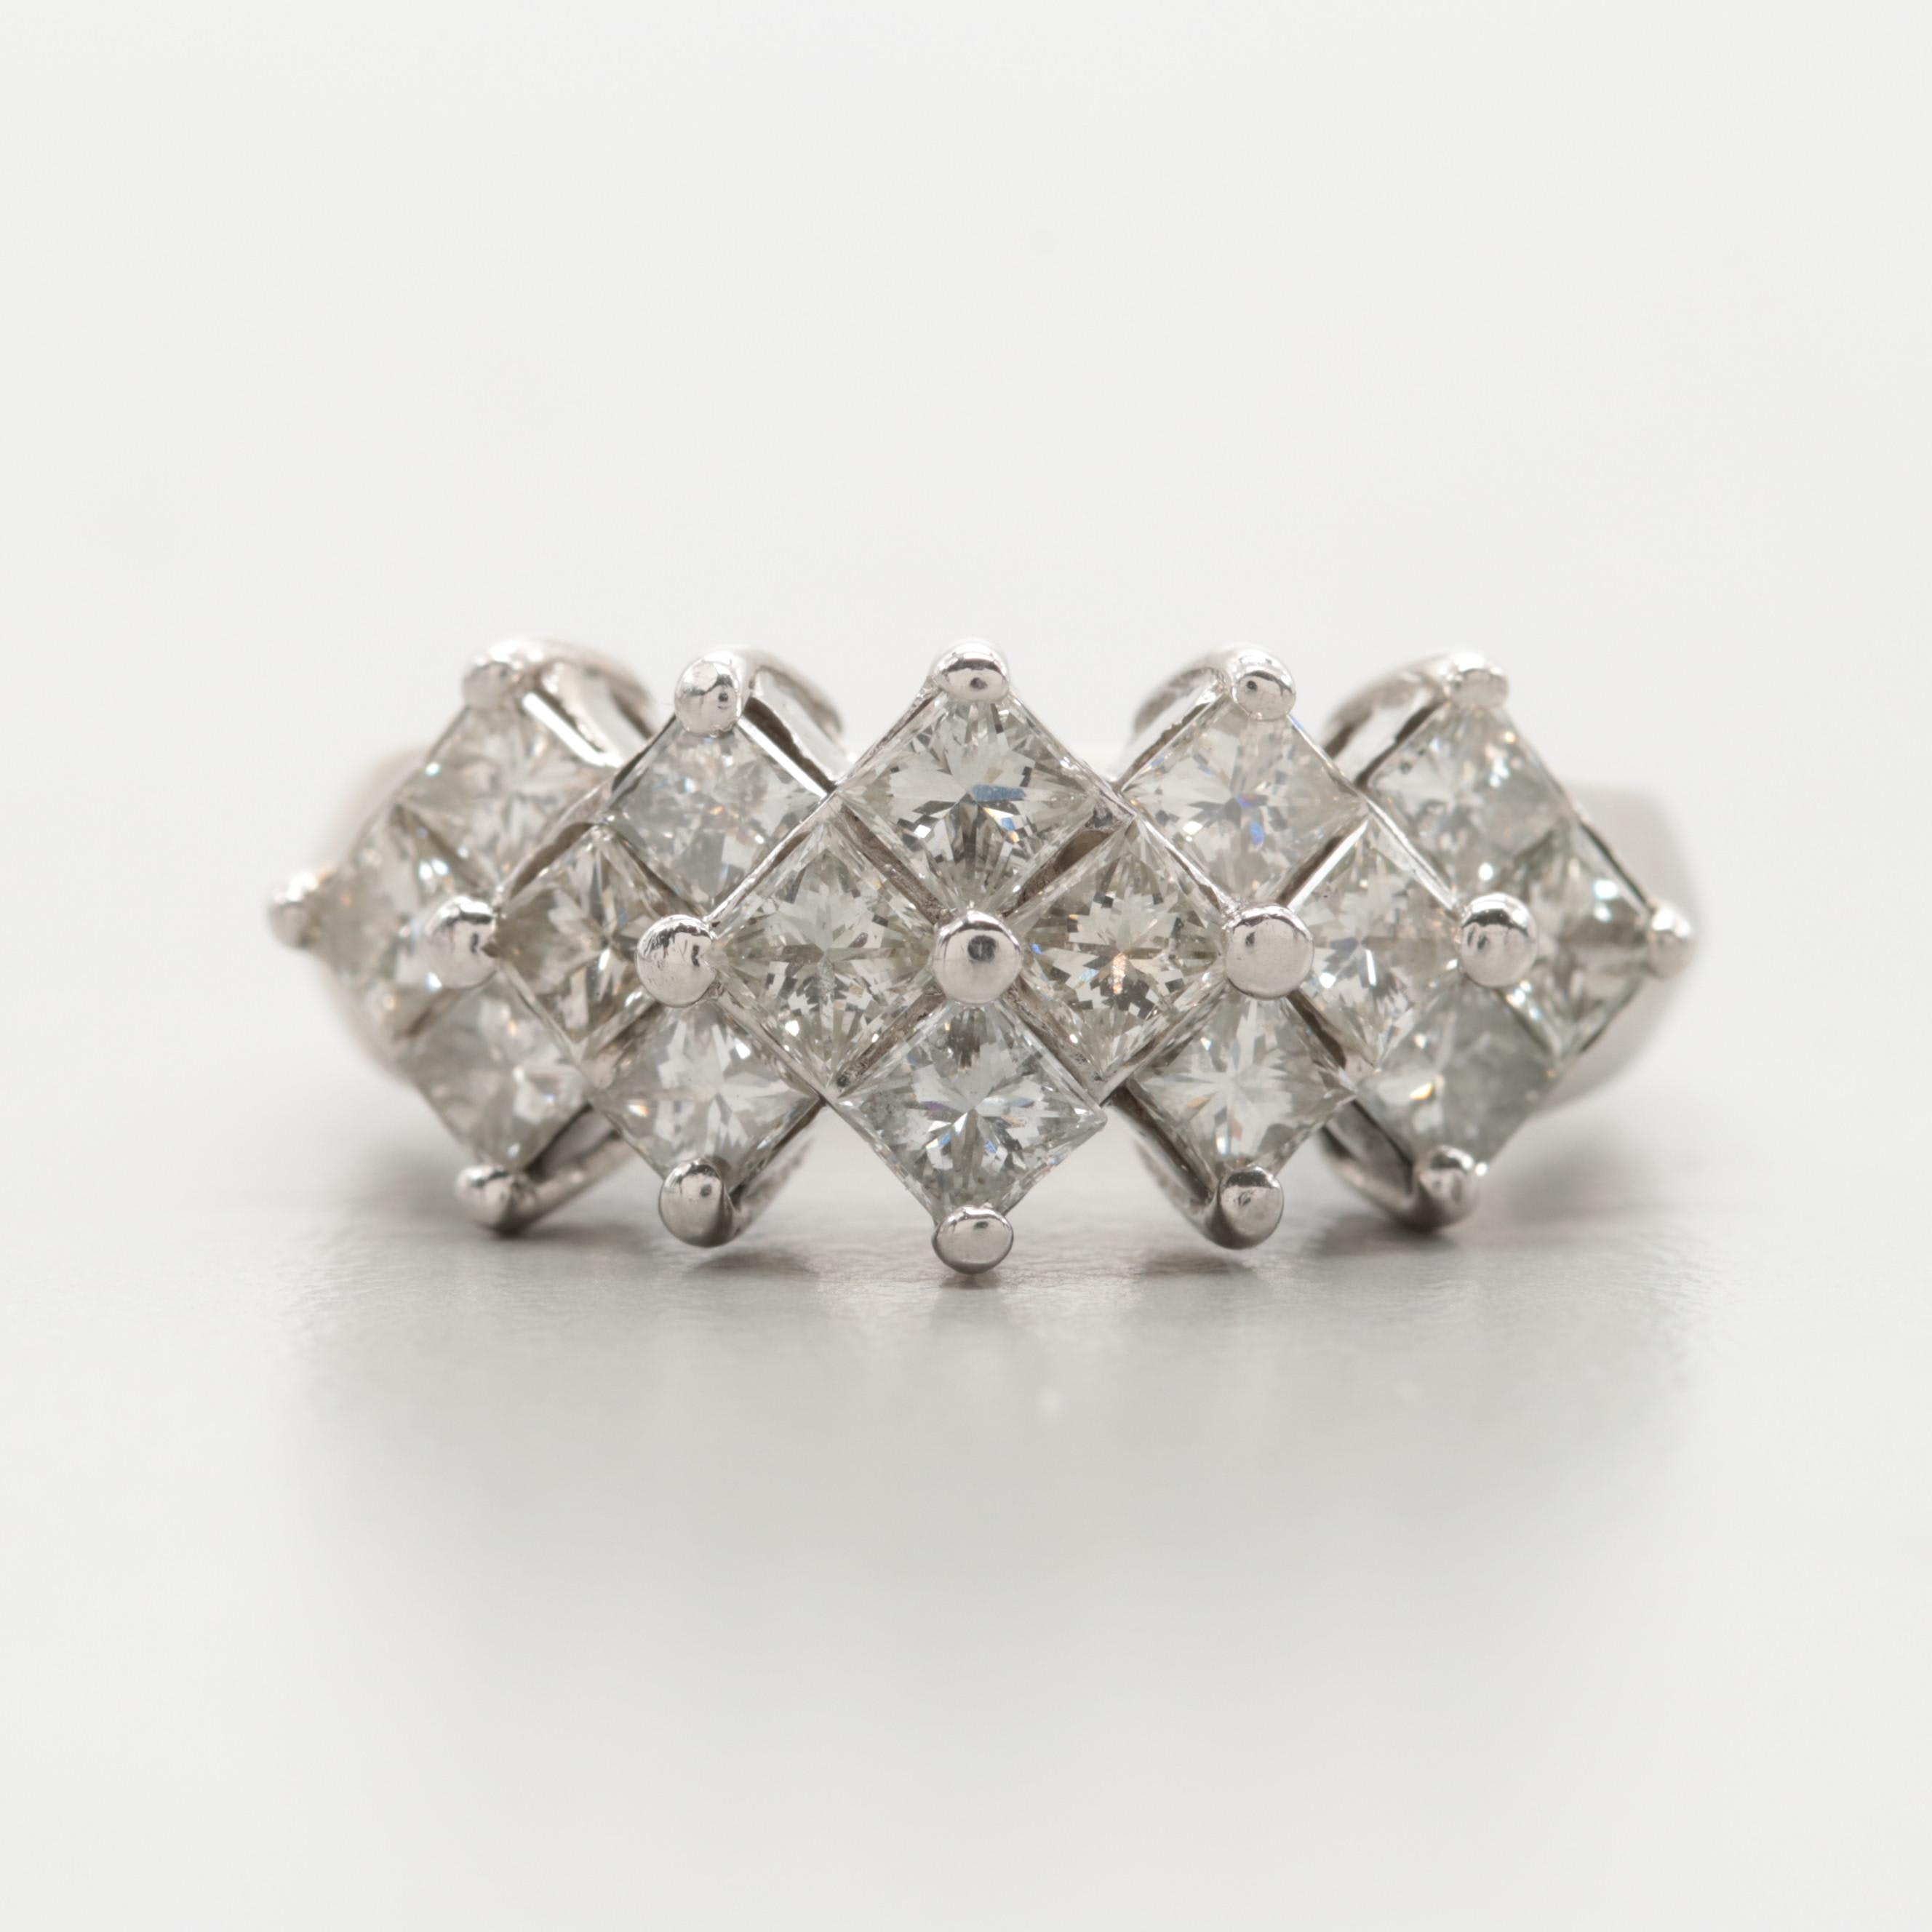 14K White Gold 1.72 Diamond Ring